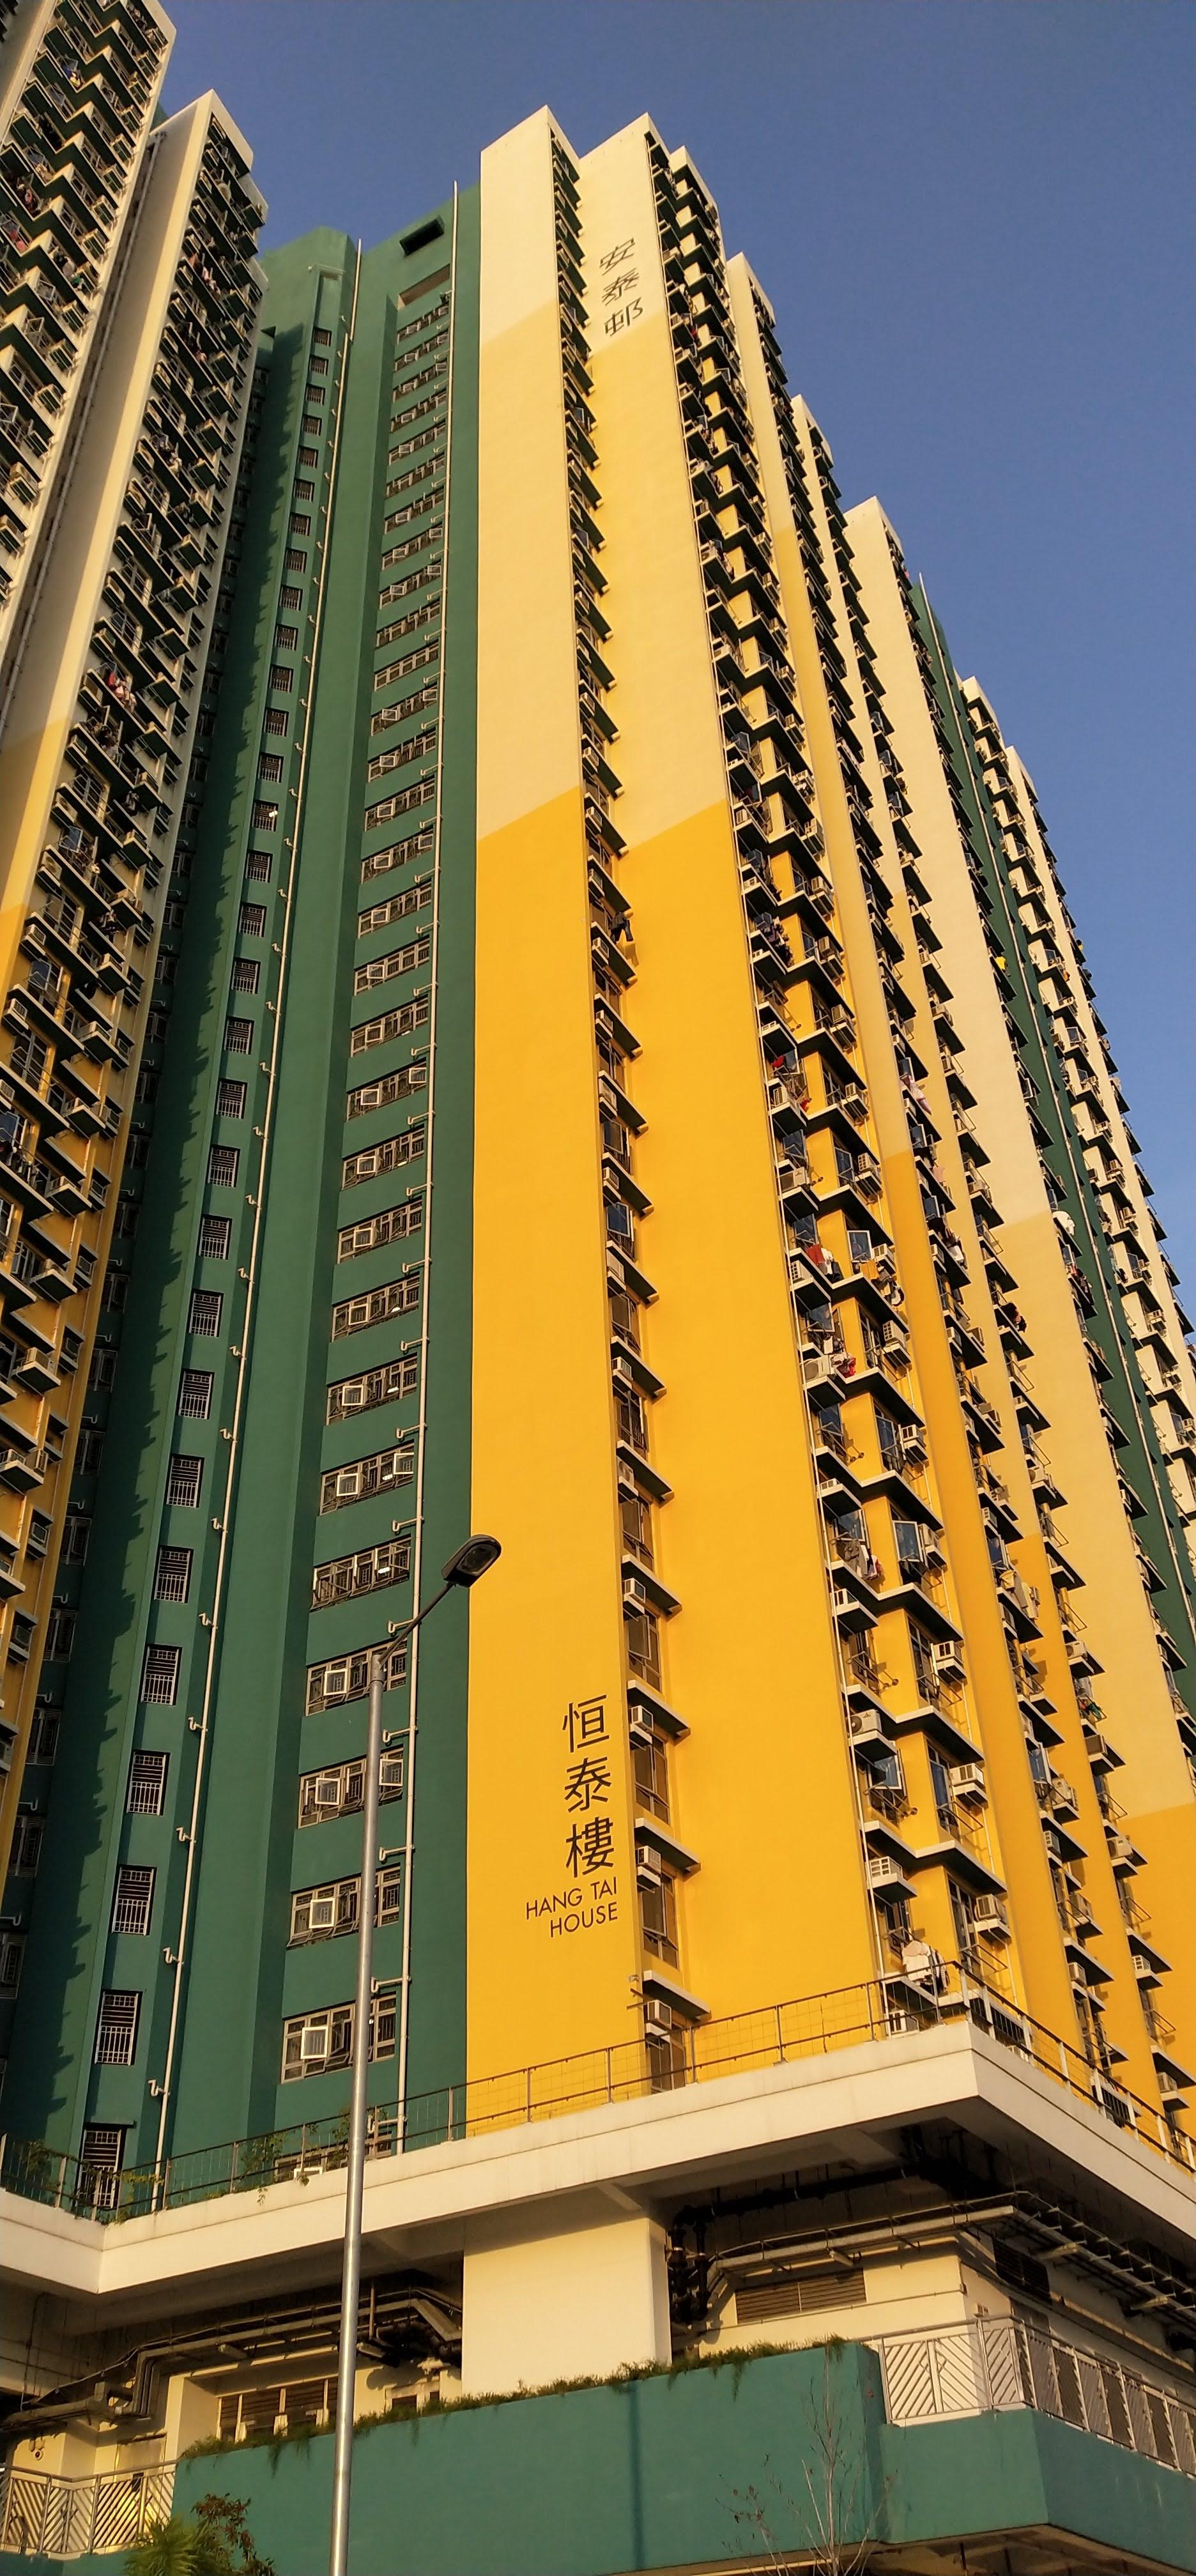 Public housing in On Tai Estate